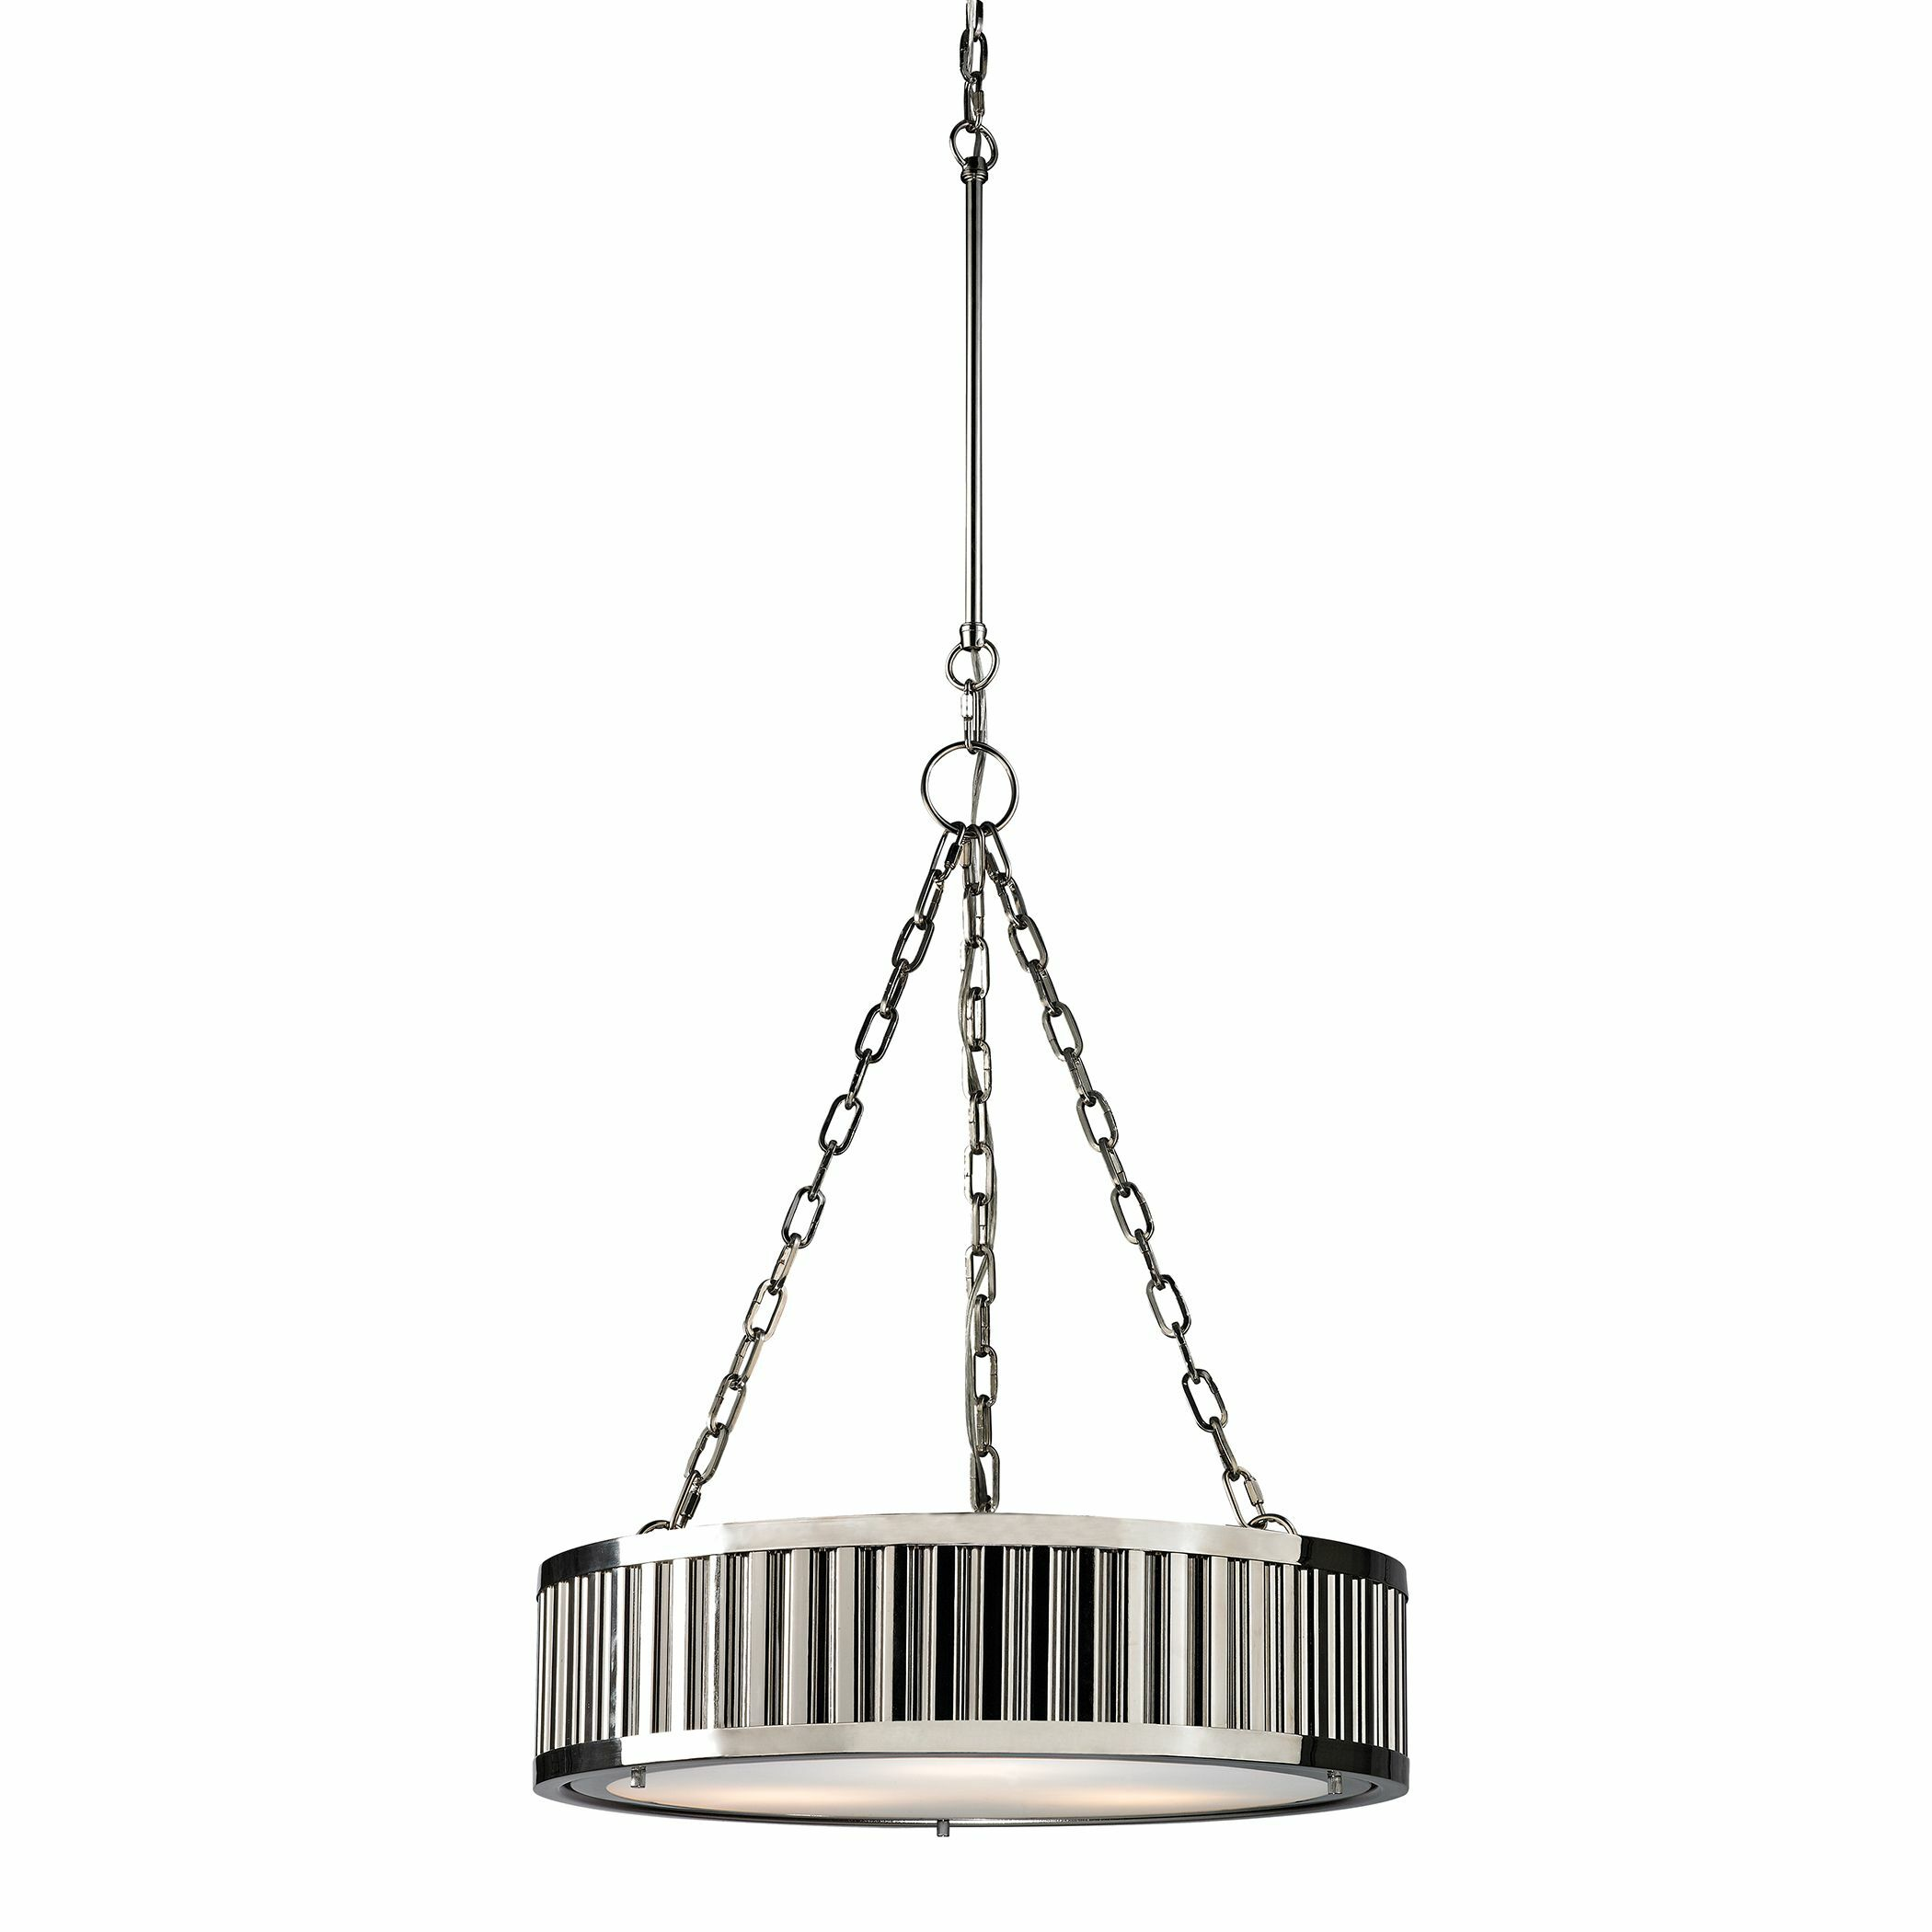 Linden 3-Light Pendant Finish: Polished Nickel, Bulb Type: Dimmable 800 Lumens 13.5W LED Bulb